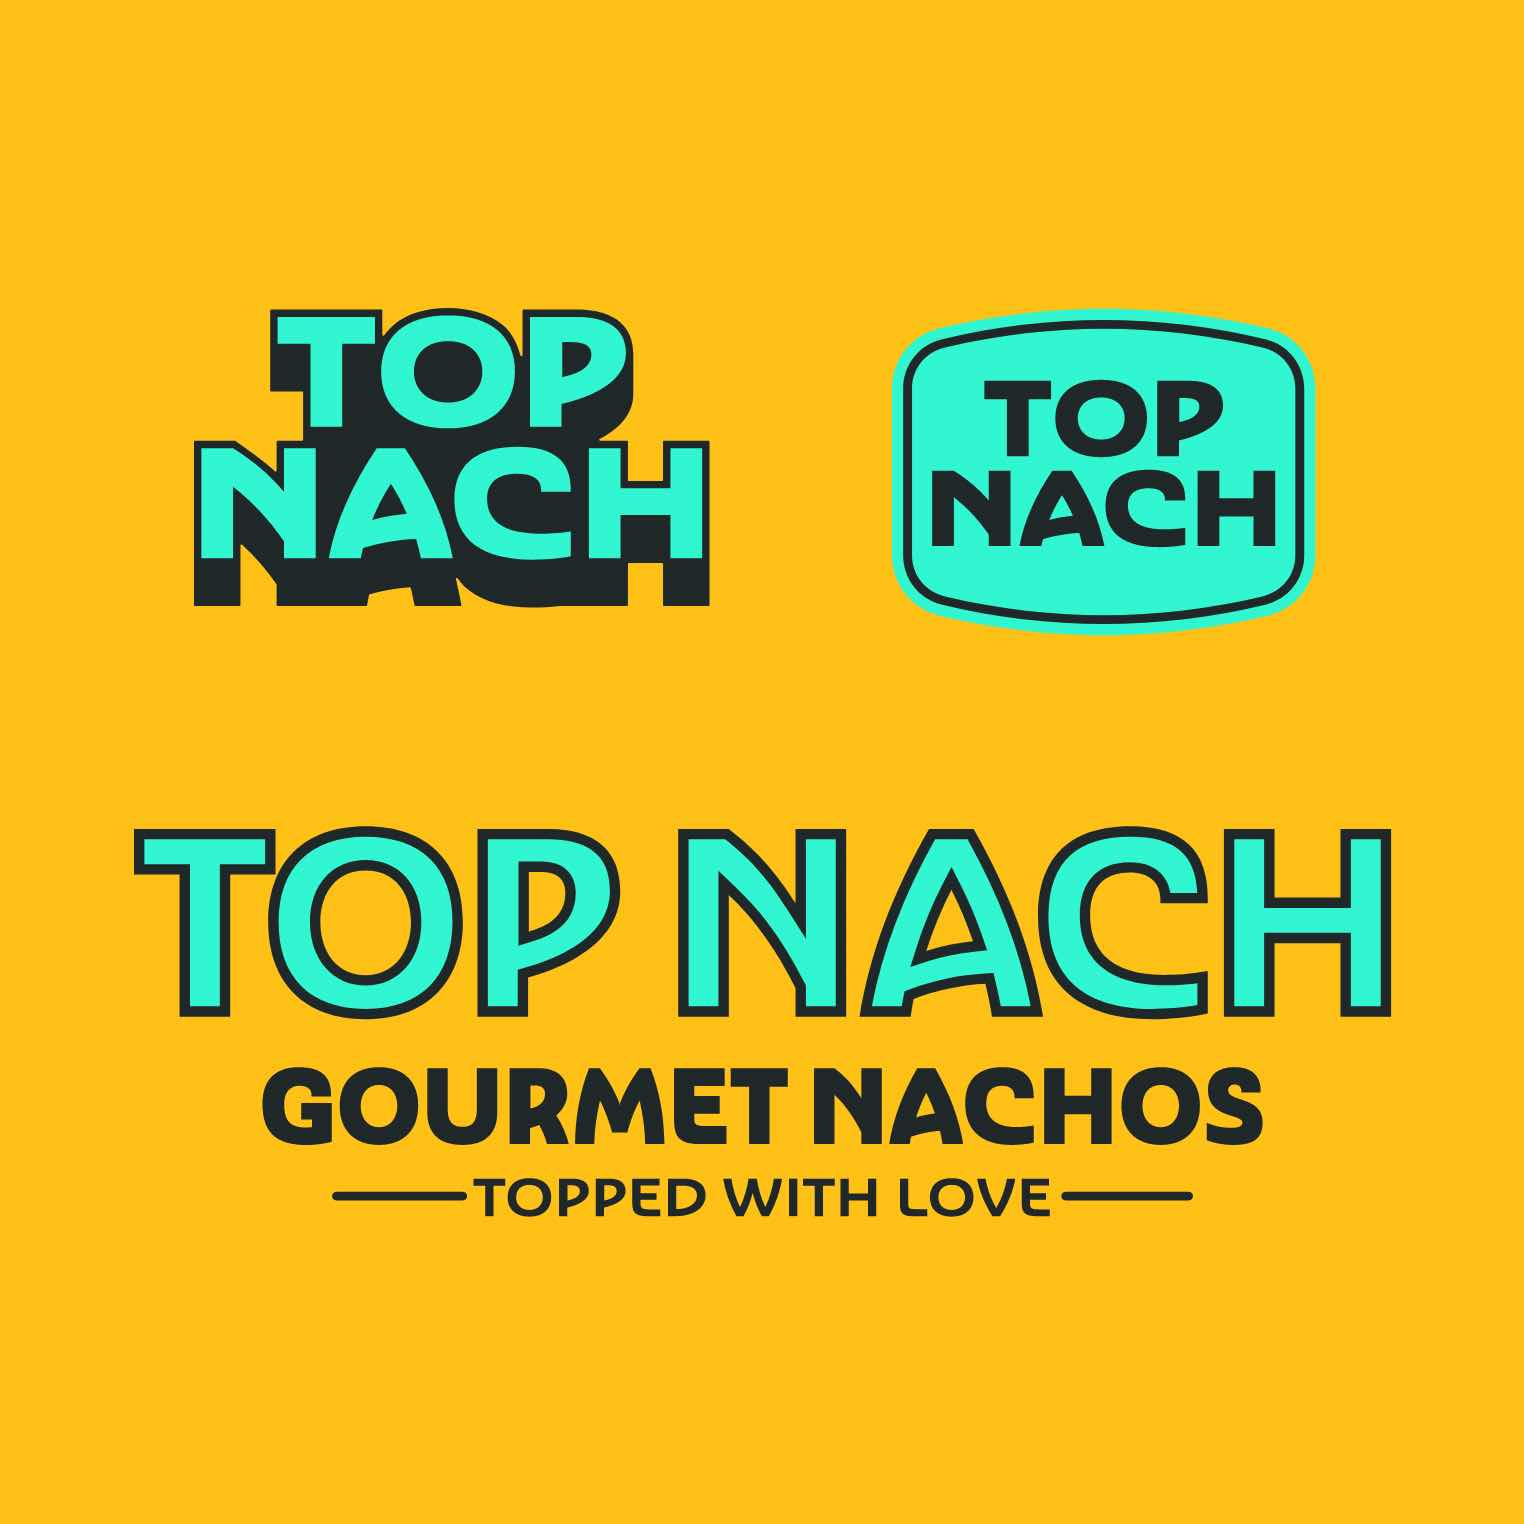 Top Nach alternate logos